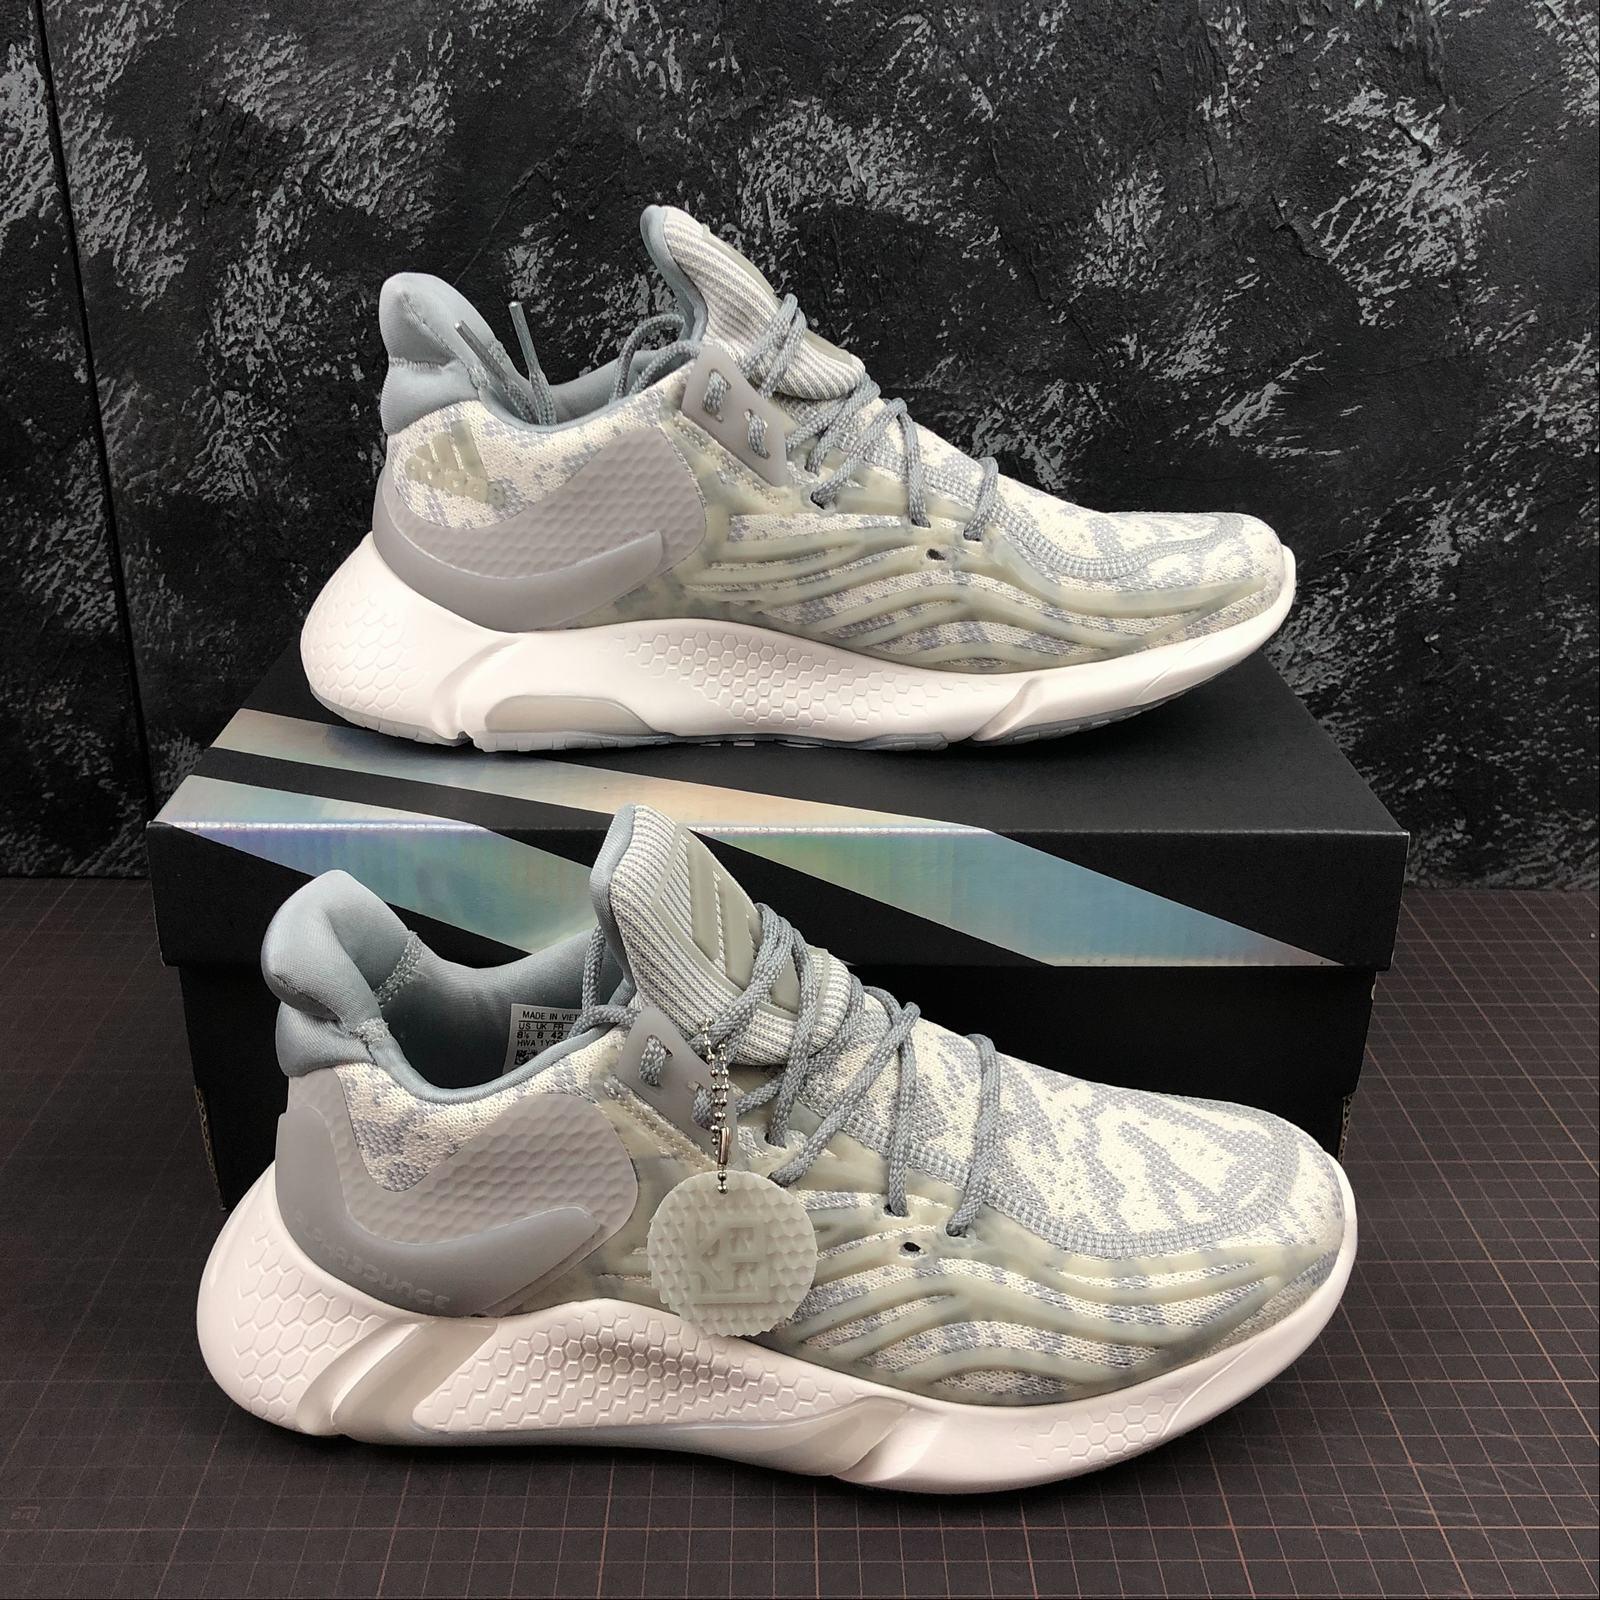 giay-sneaker-adidas-alphabounce-yeezy-boost-ay6686